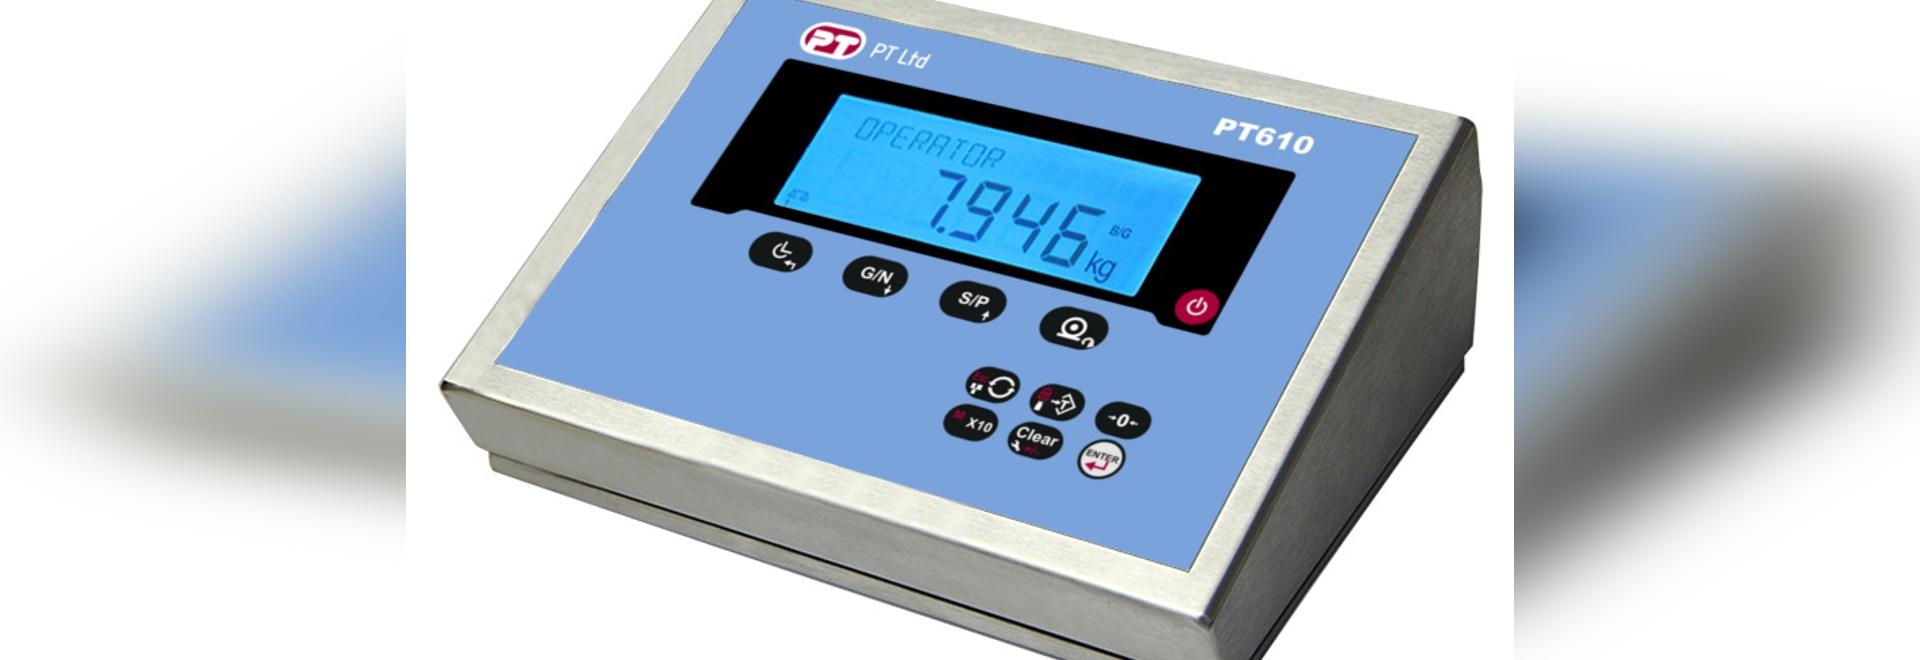 PT610 Digital Indicator